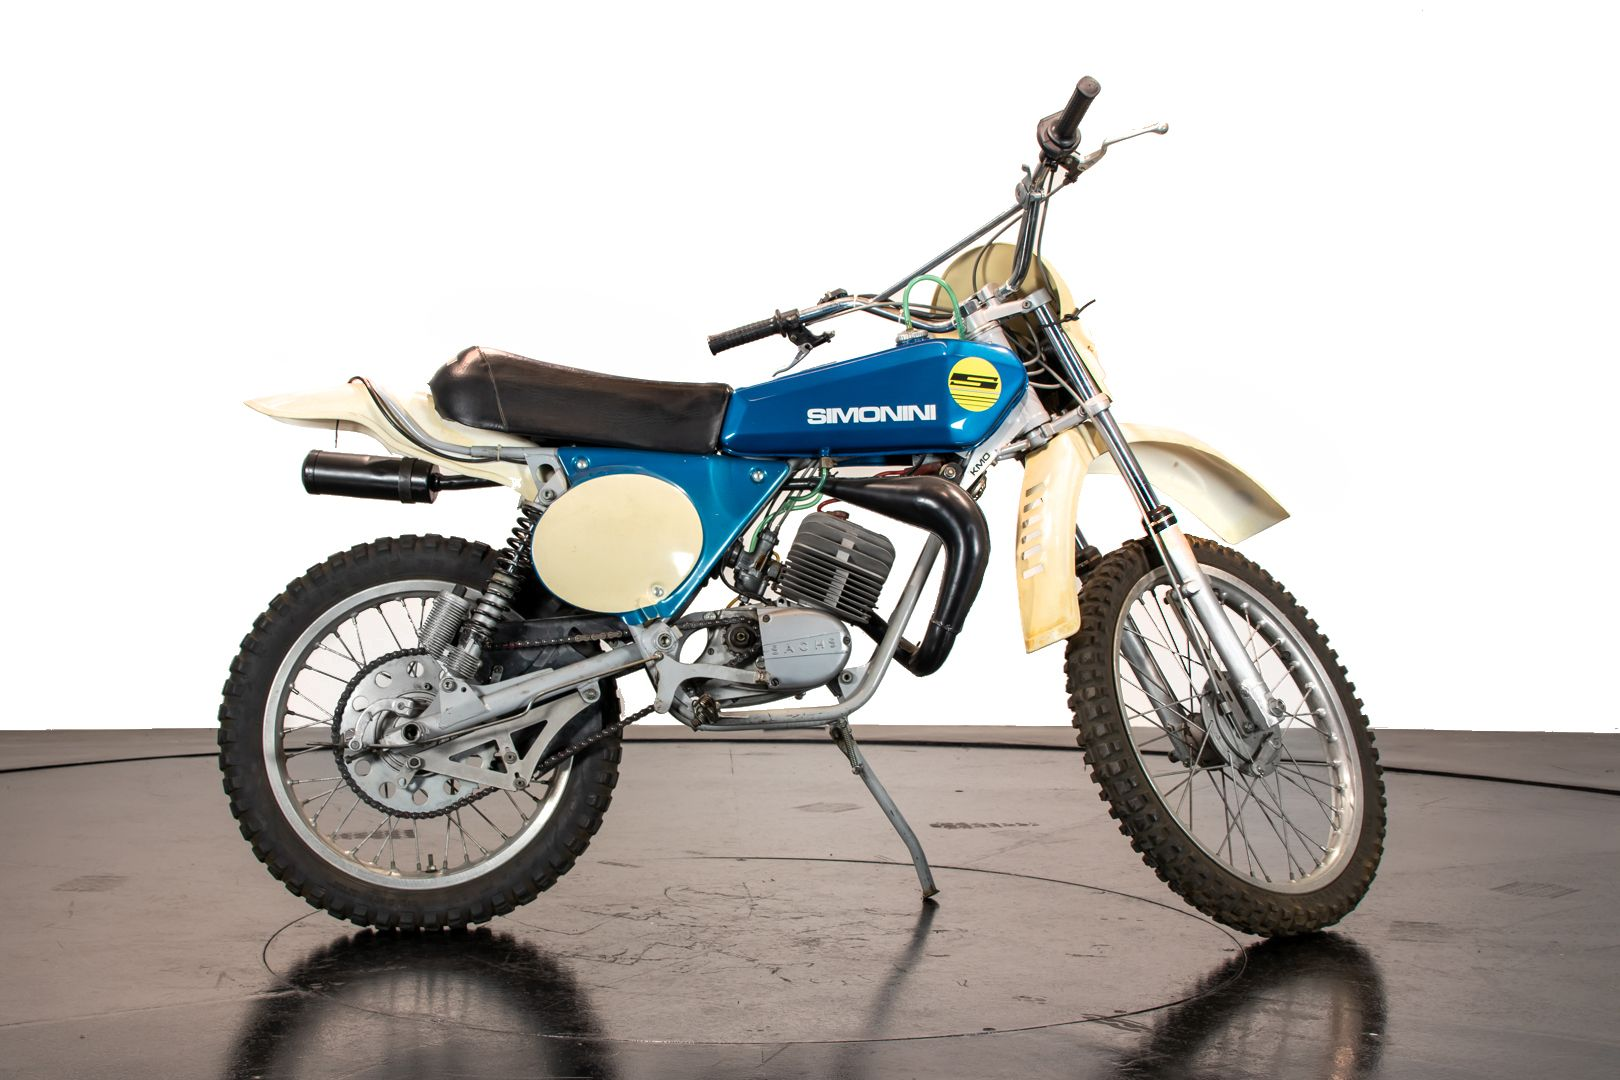 1977 Simonini S-S 61810